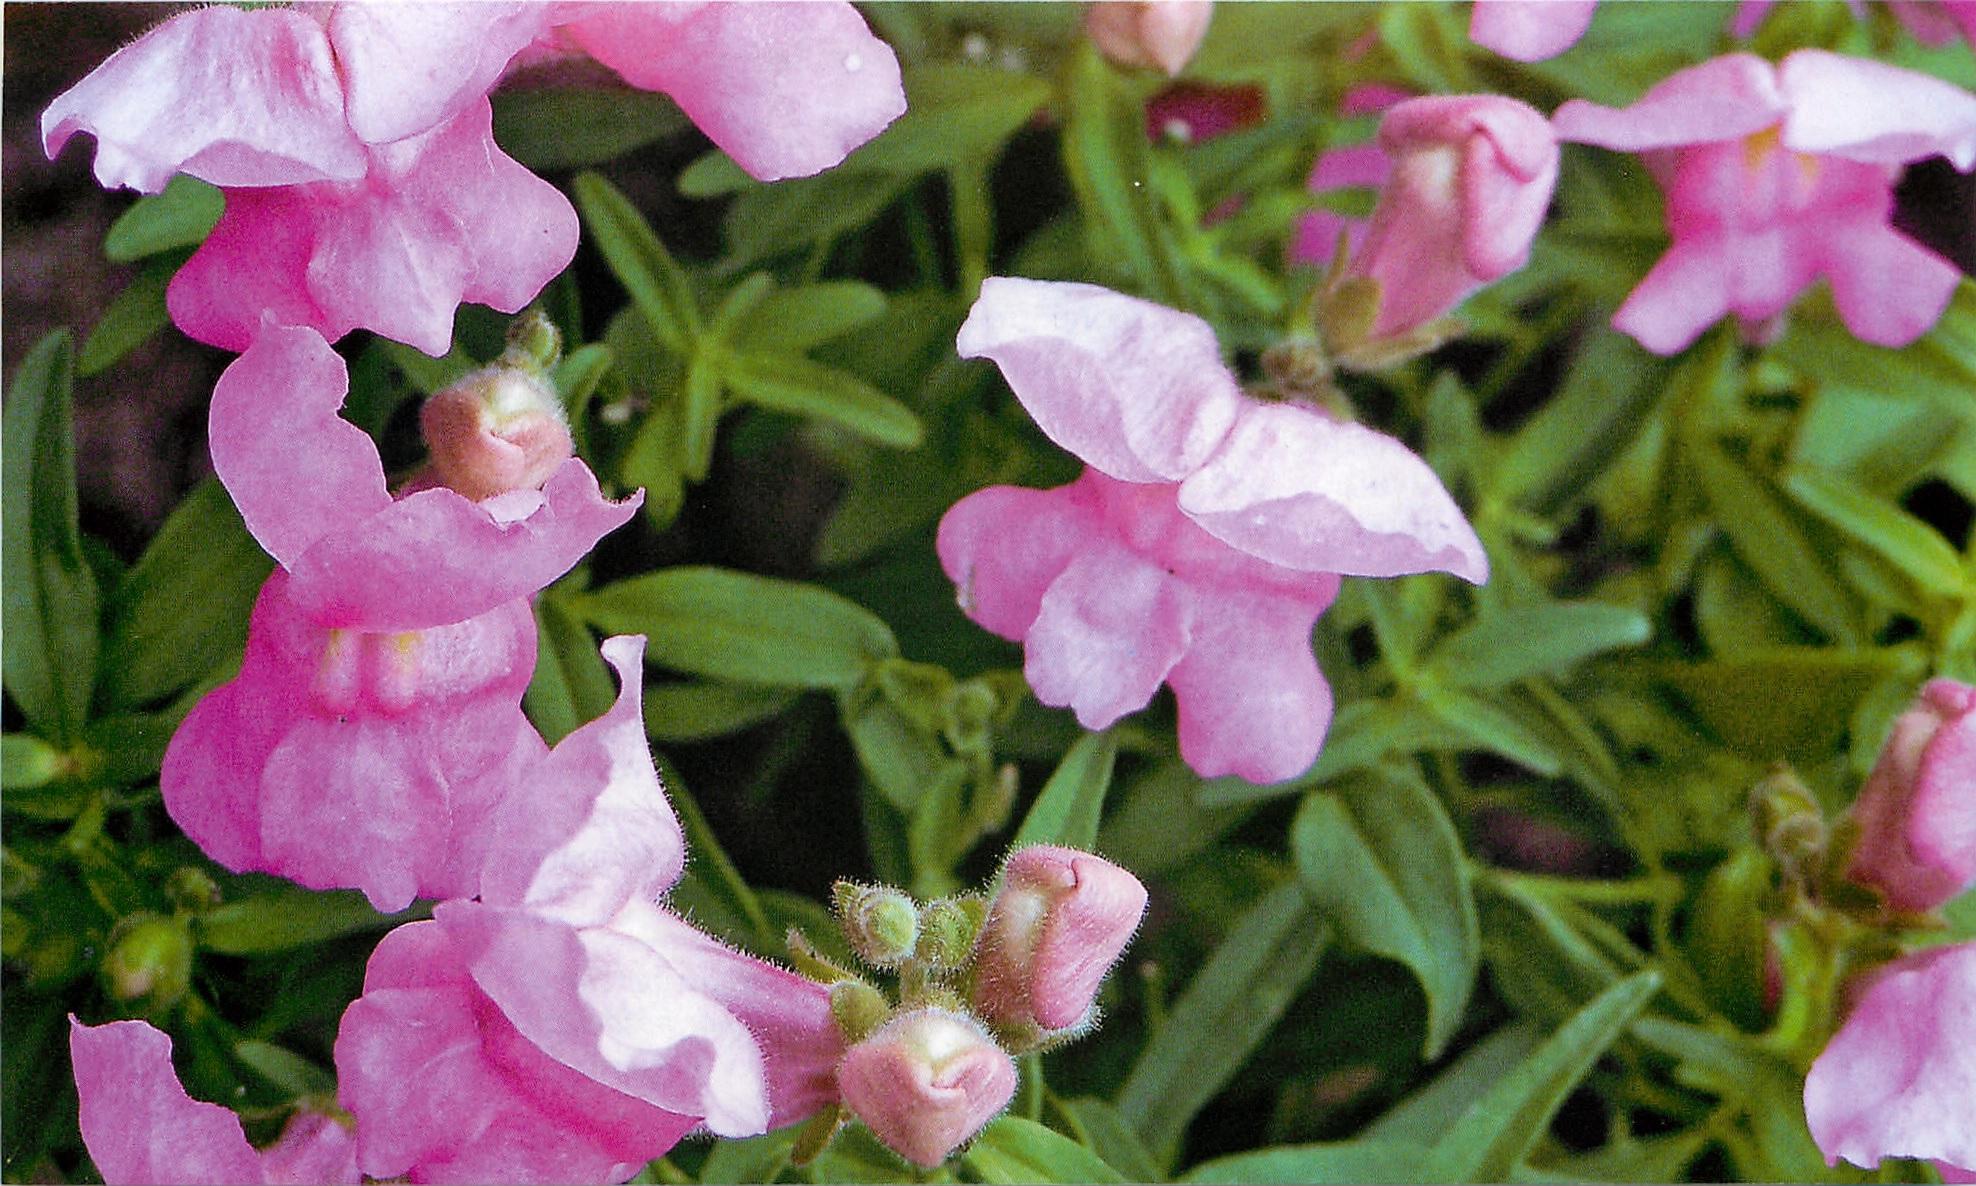 Розовый цветок львиного зева